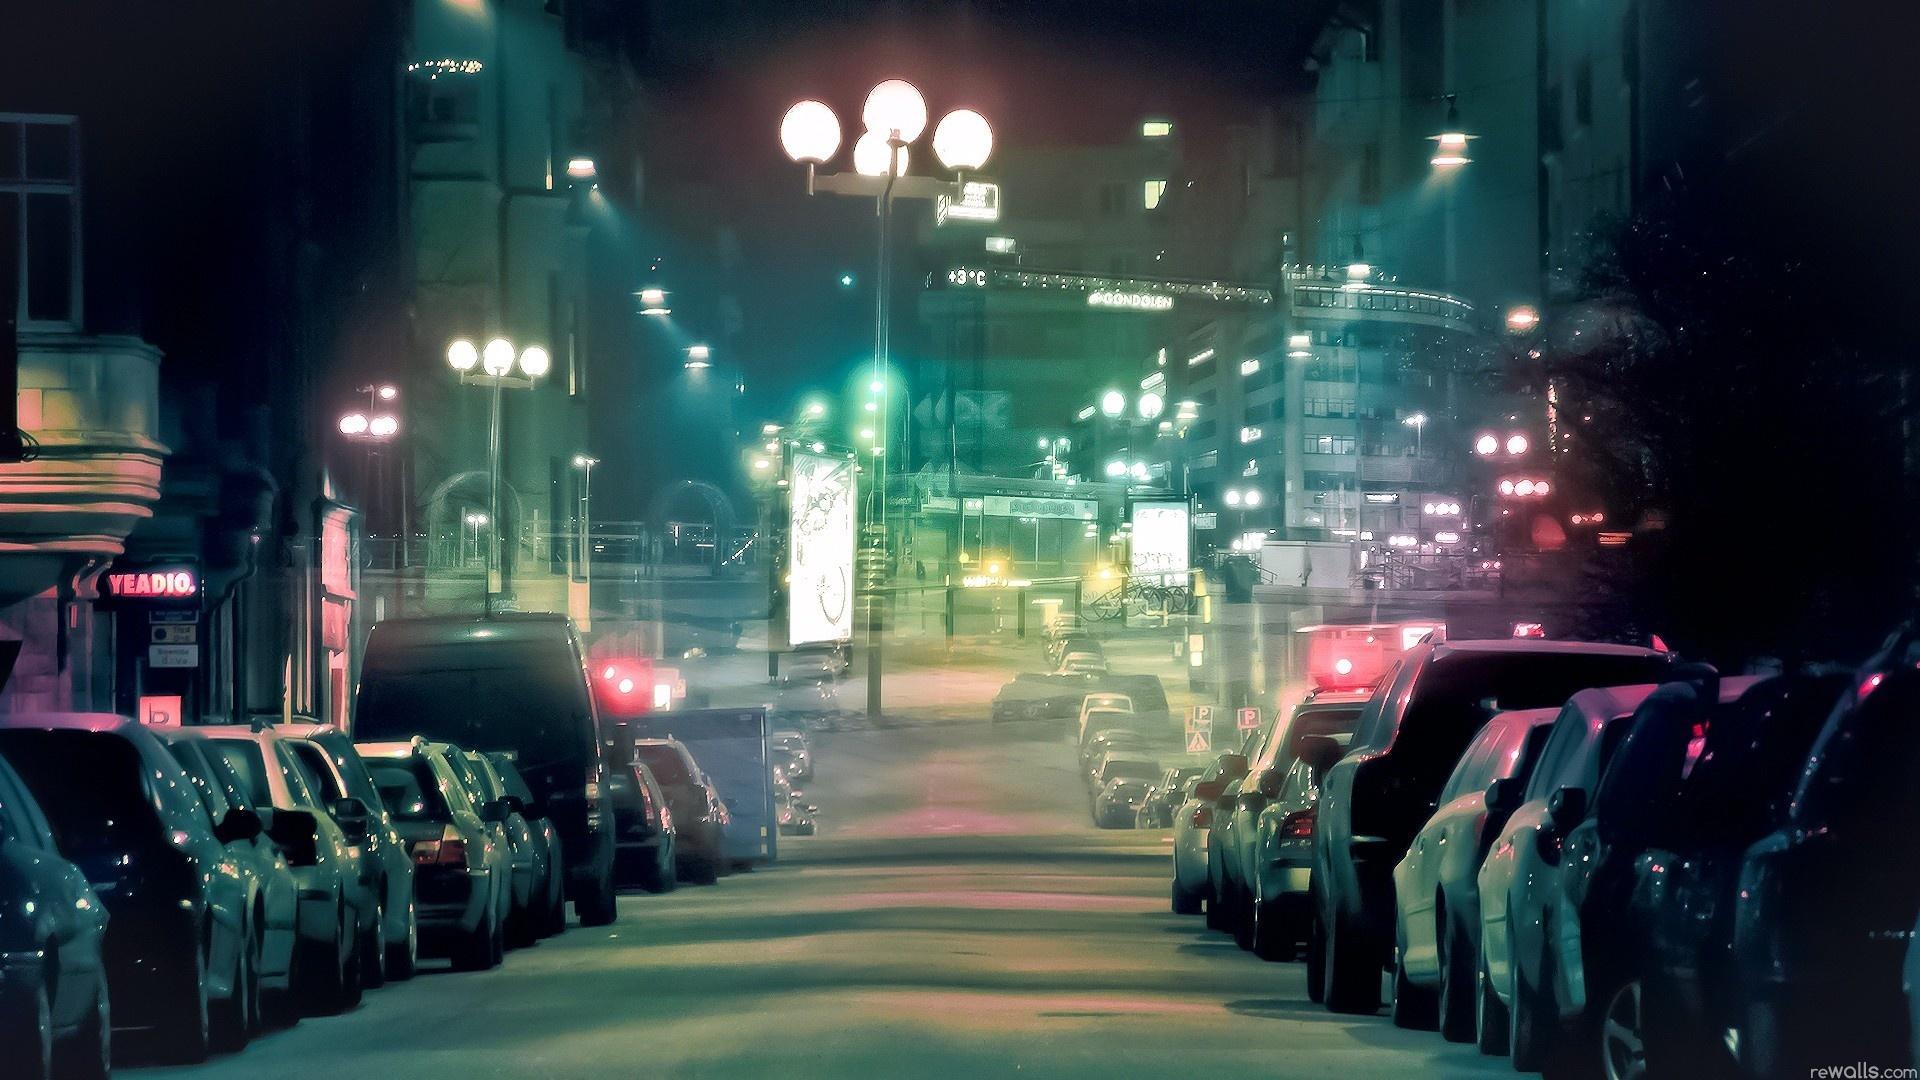 Город ночь фонари улица машины обои